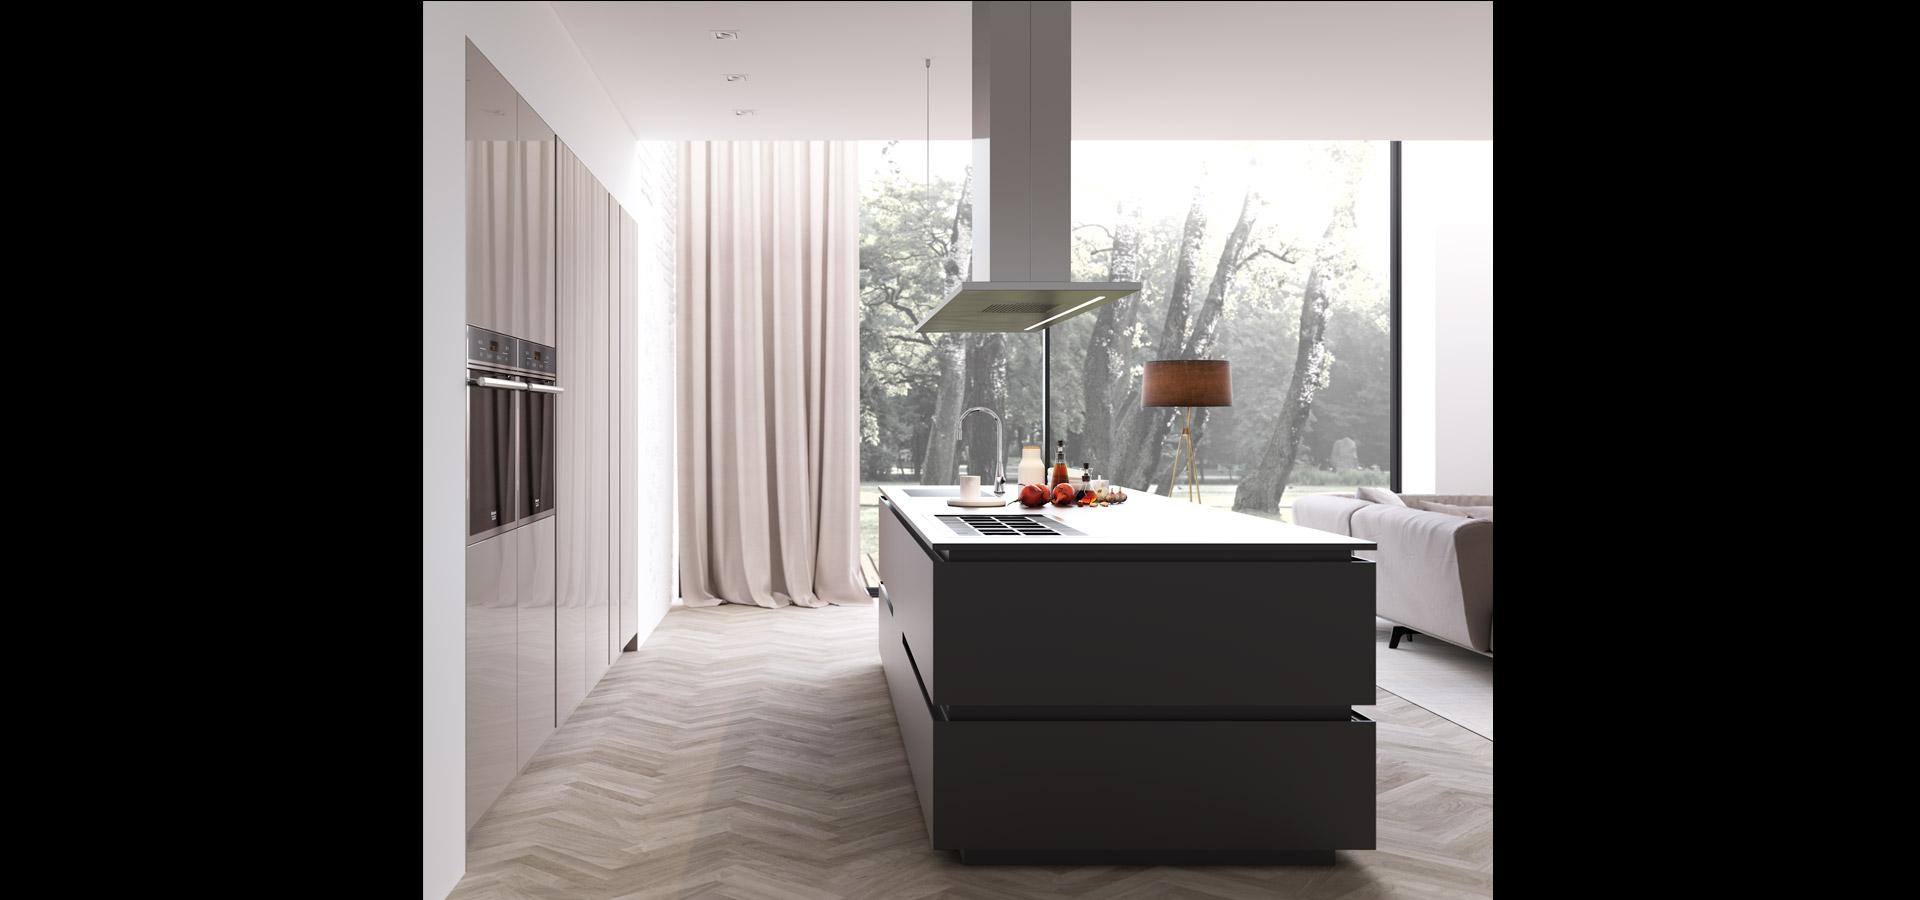 Cucina elegante Made in Italy | Tilo | MITON Cucine